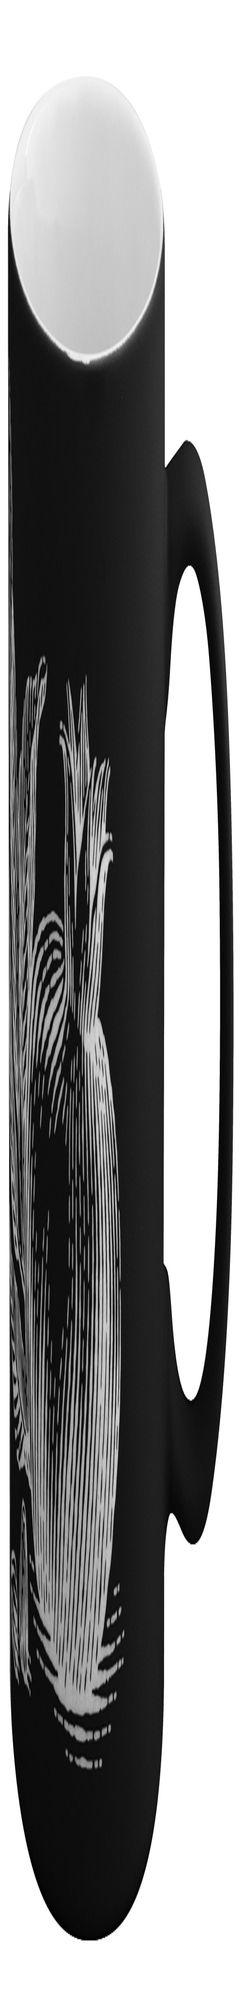 Кружка Grand Granat с покрытием софт-тач, черная фото